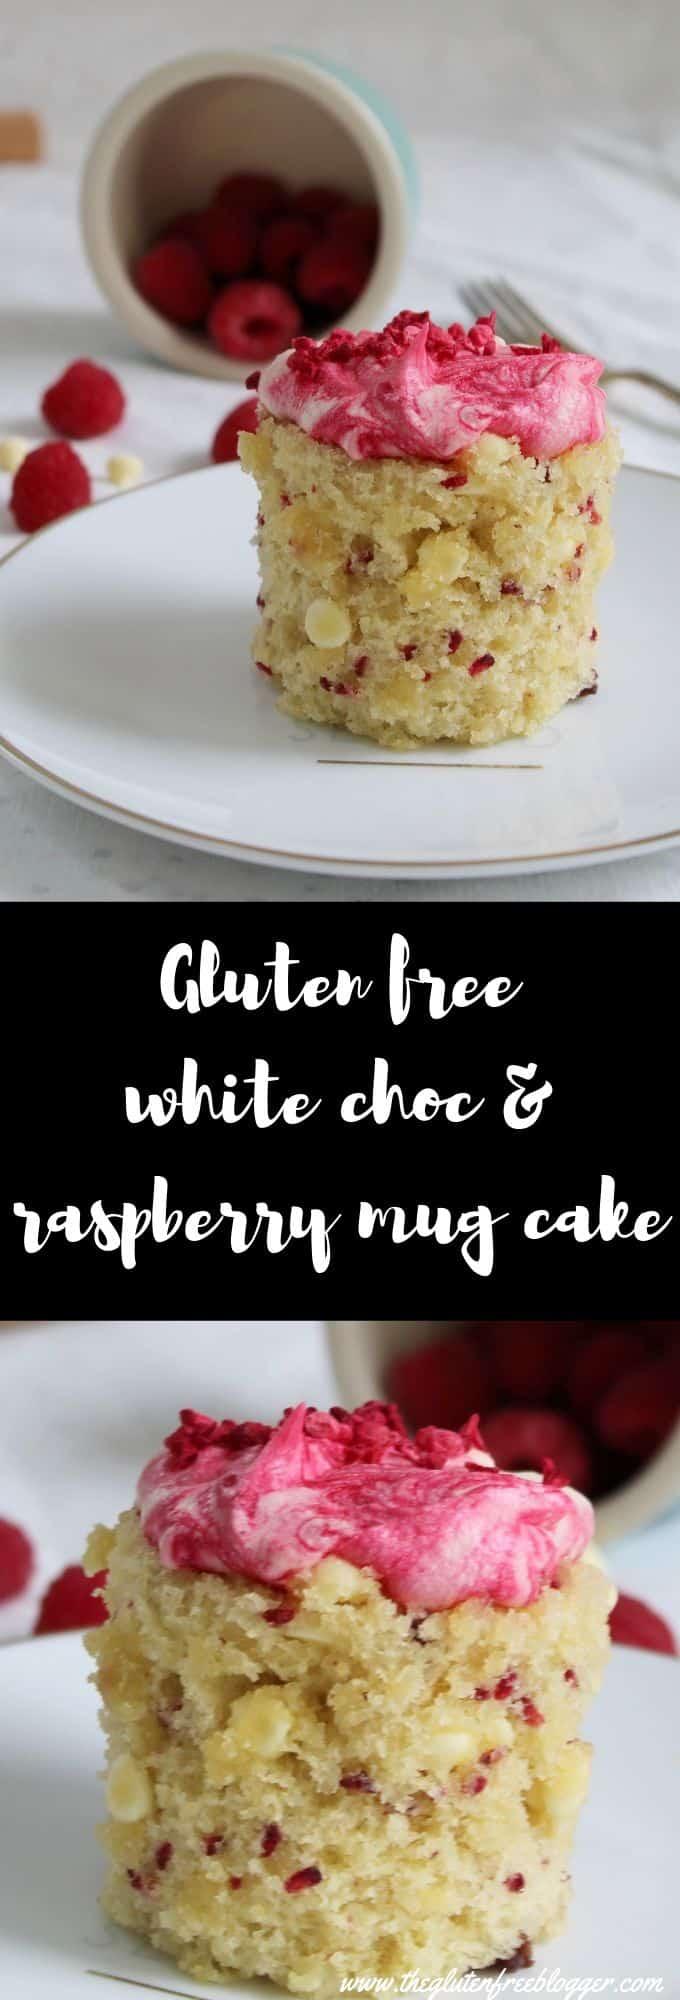 gluten free mug cake recipes - easy mug cake - coeliac friendly dairy free mug cake recipe white choc raspberry